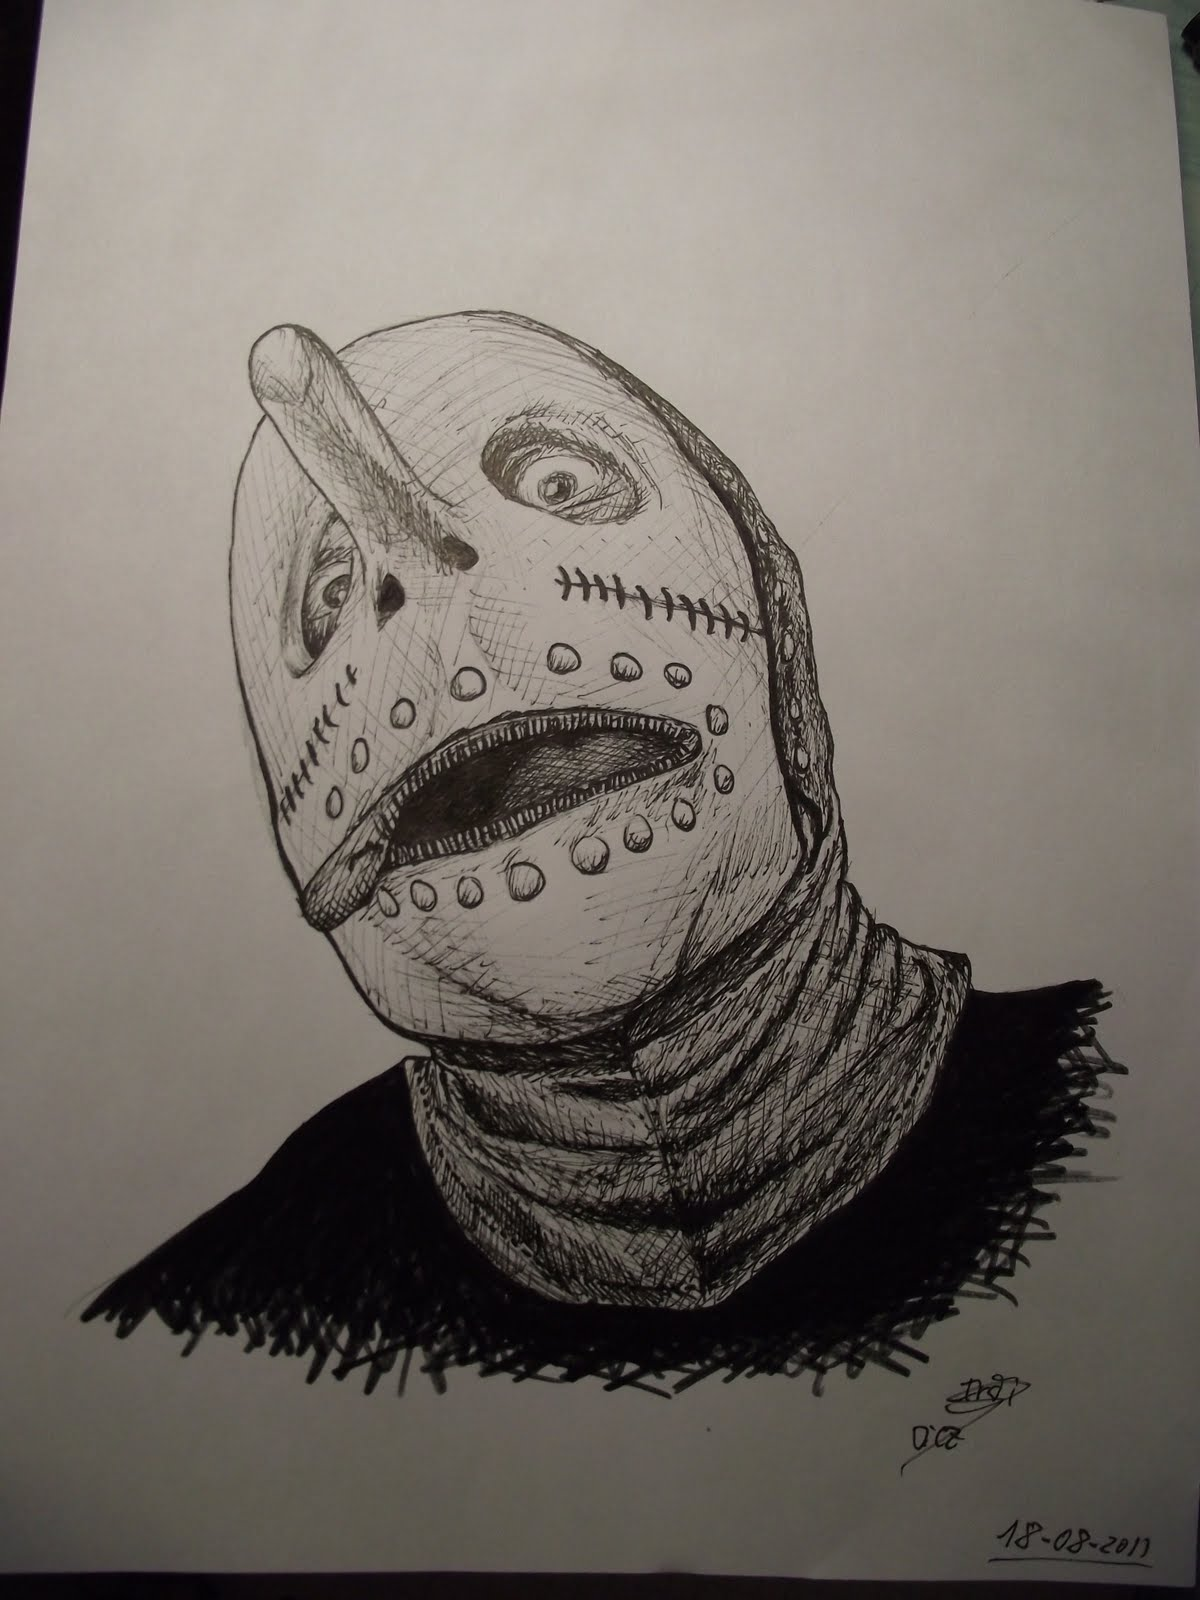 Hris Fehn De Slipknot Dibujos De Ir At T 10 C